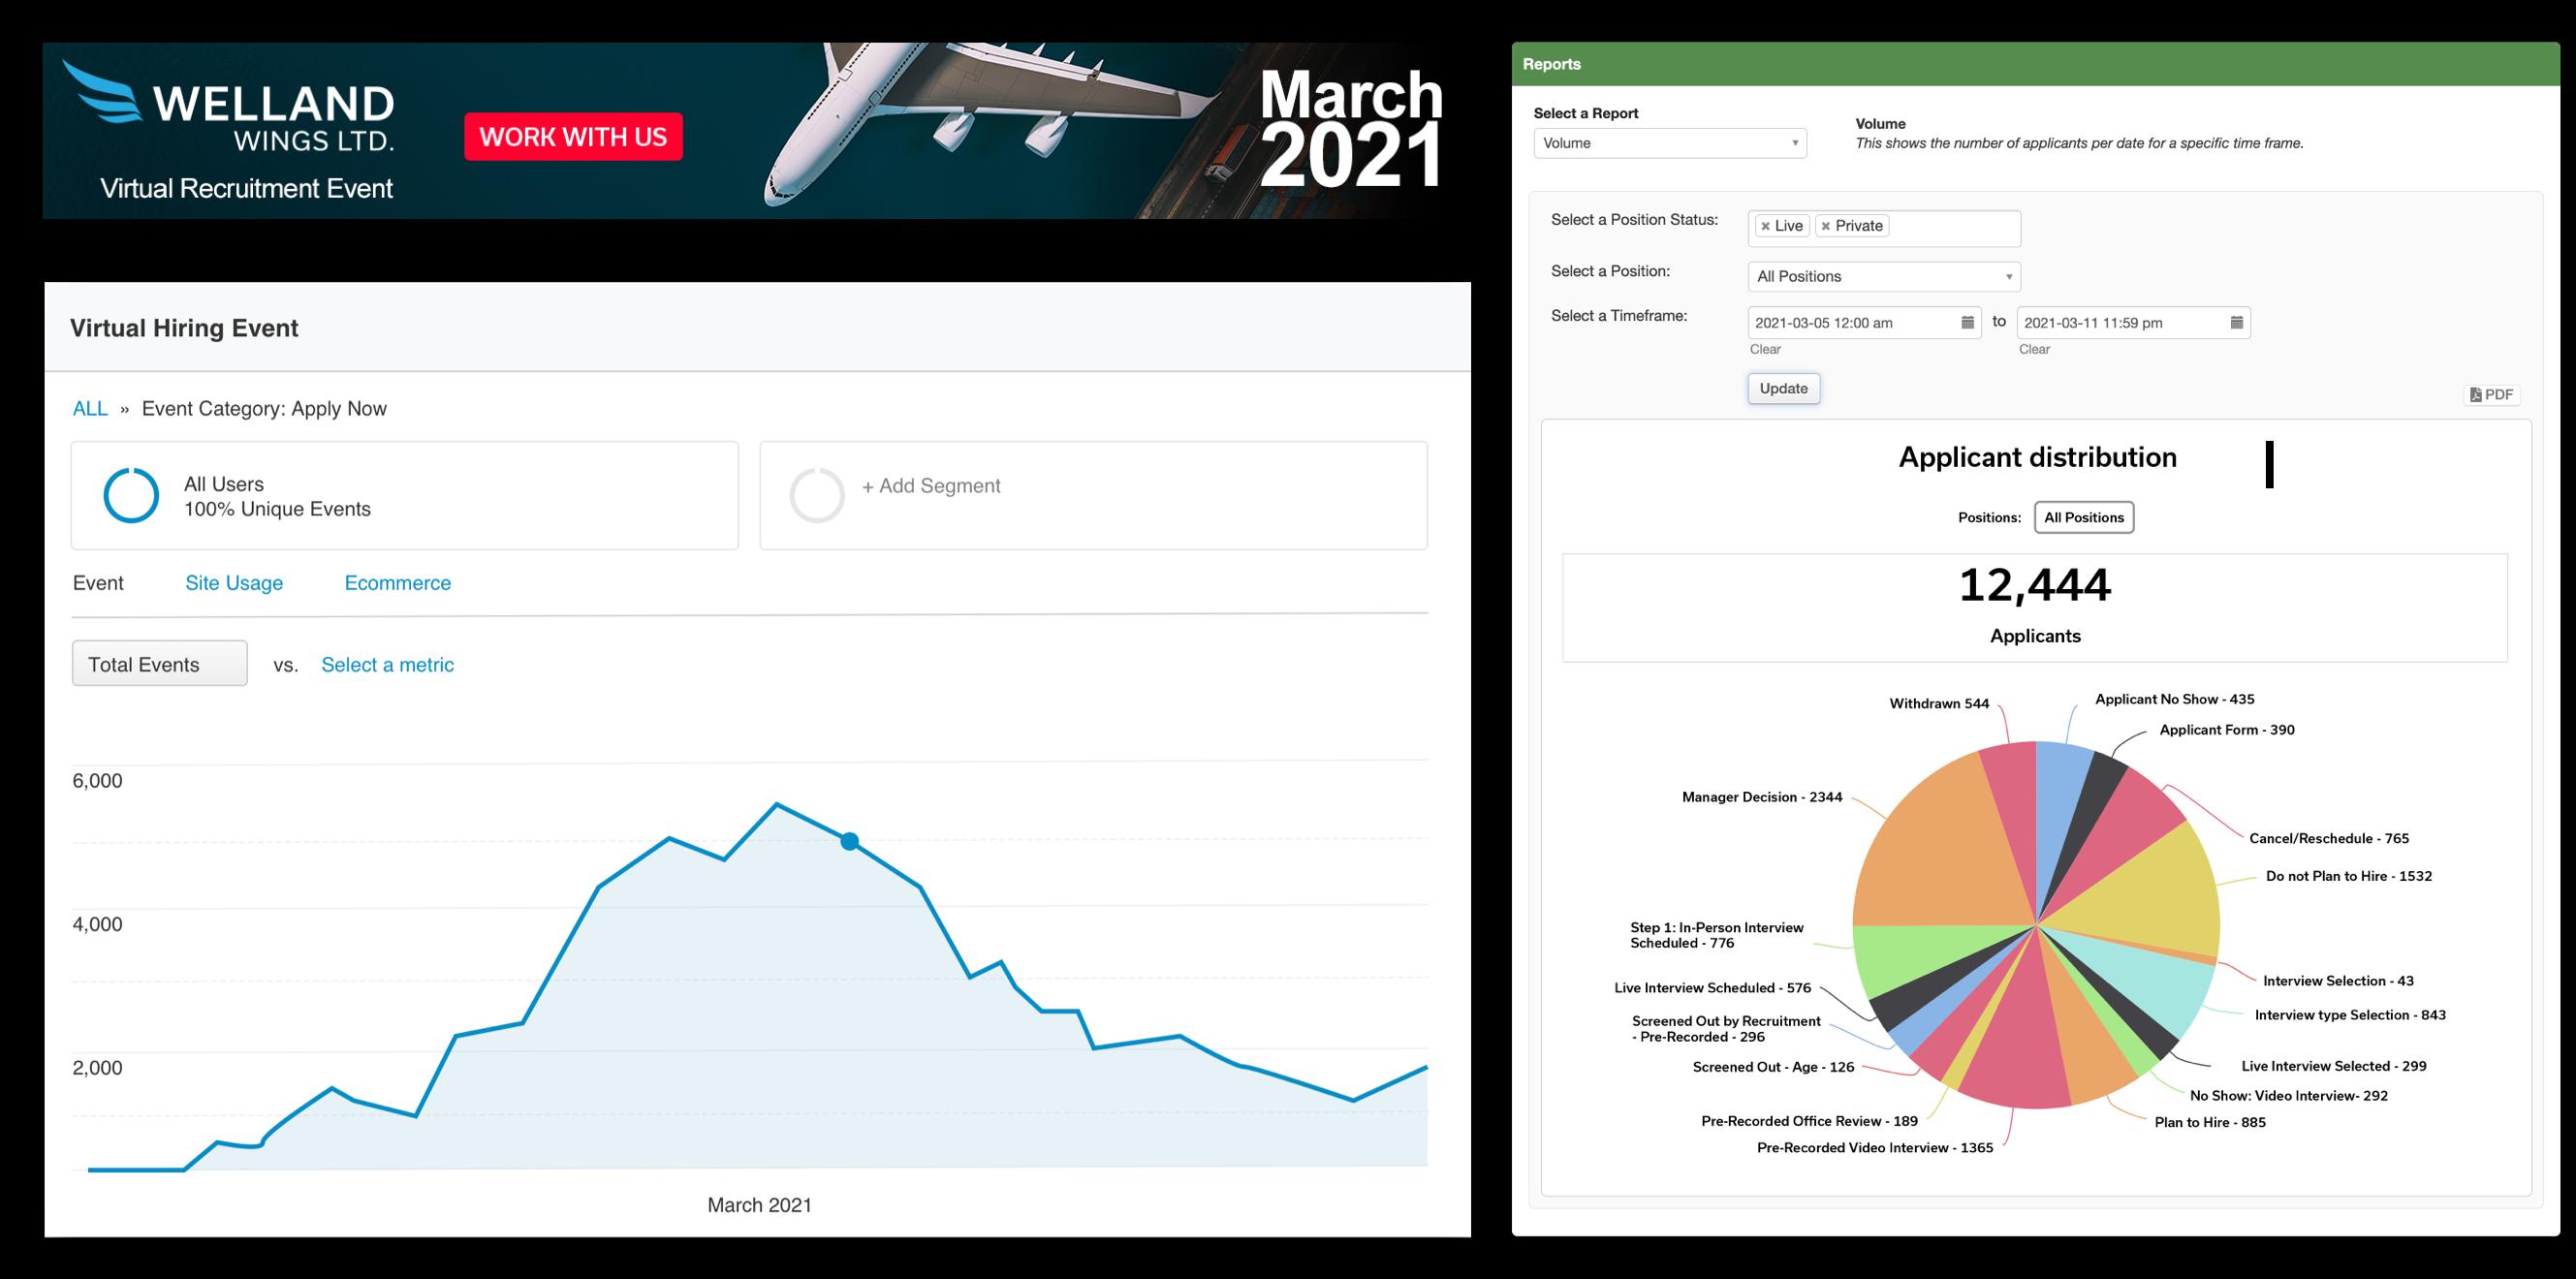 Virtual Event Attraction Metrics